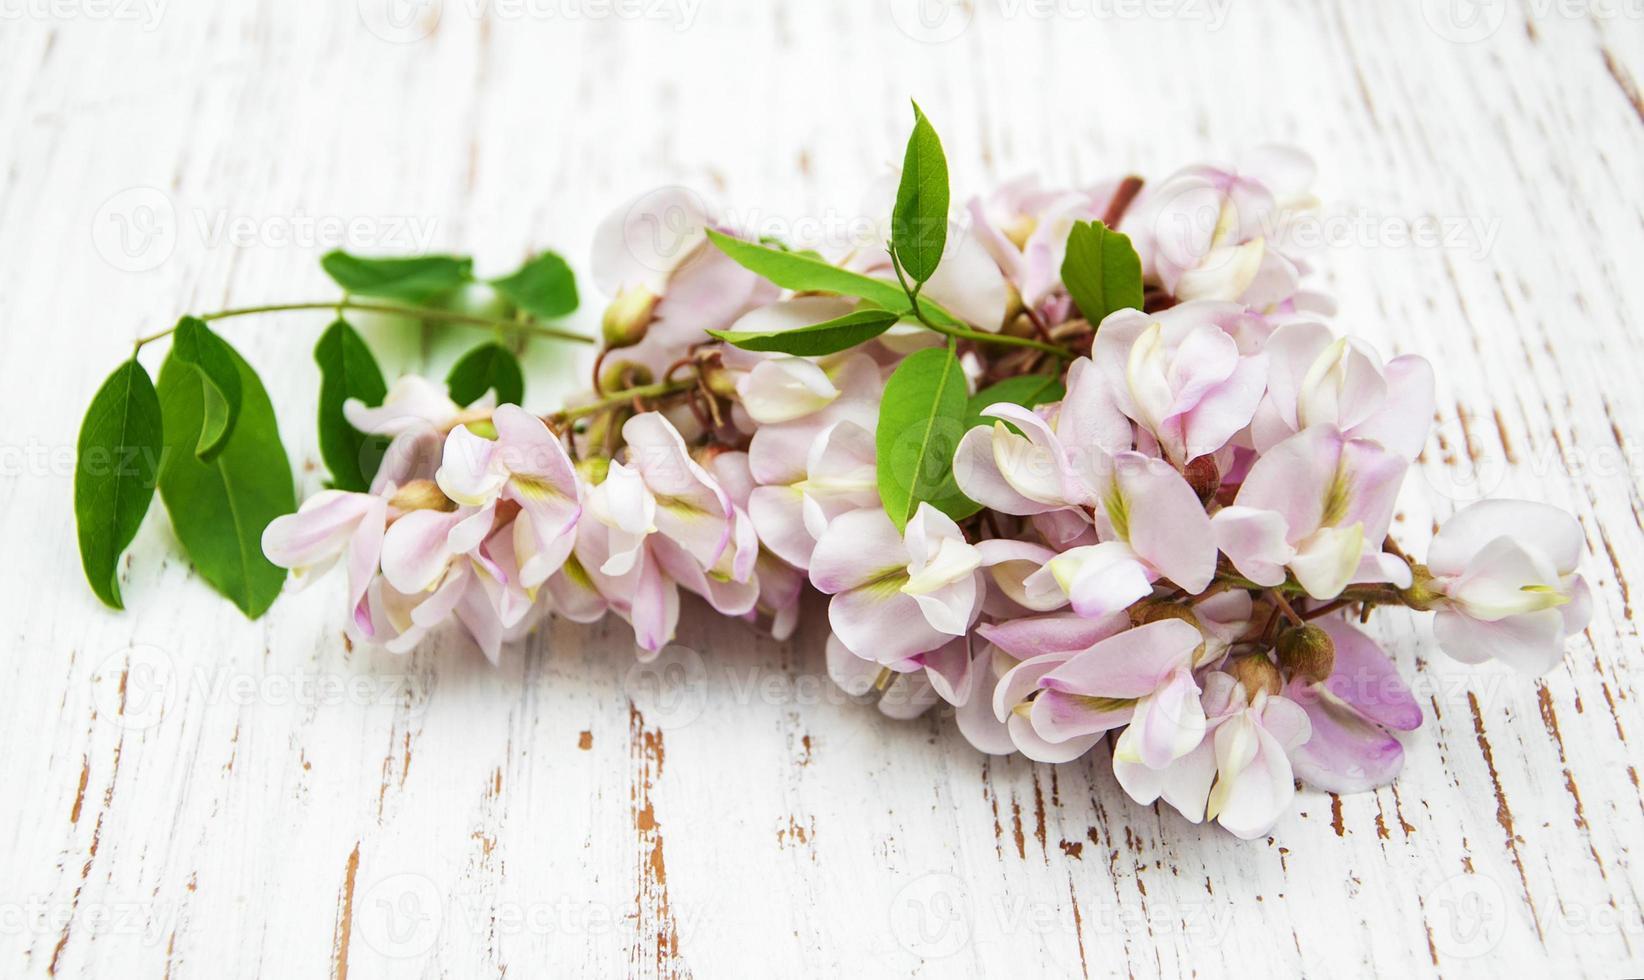 flores de acacia foto